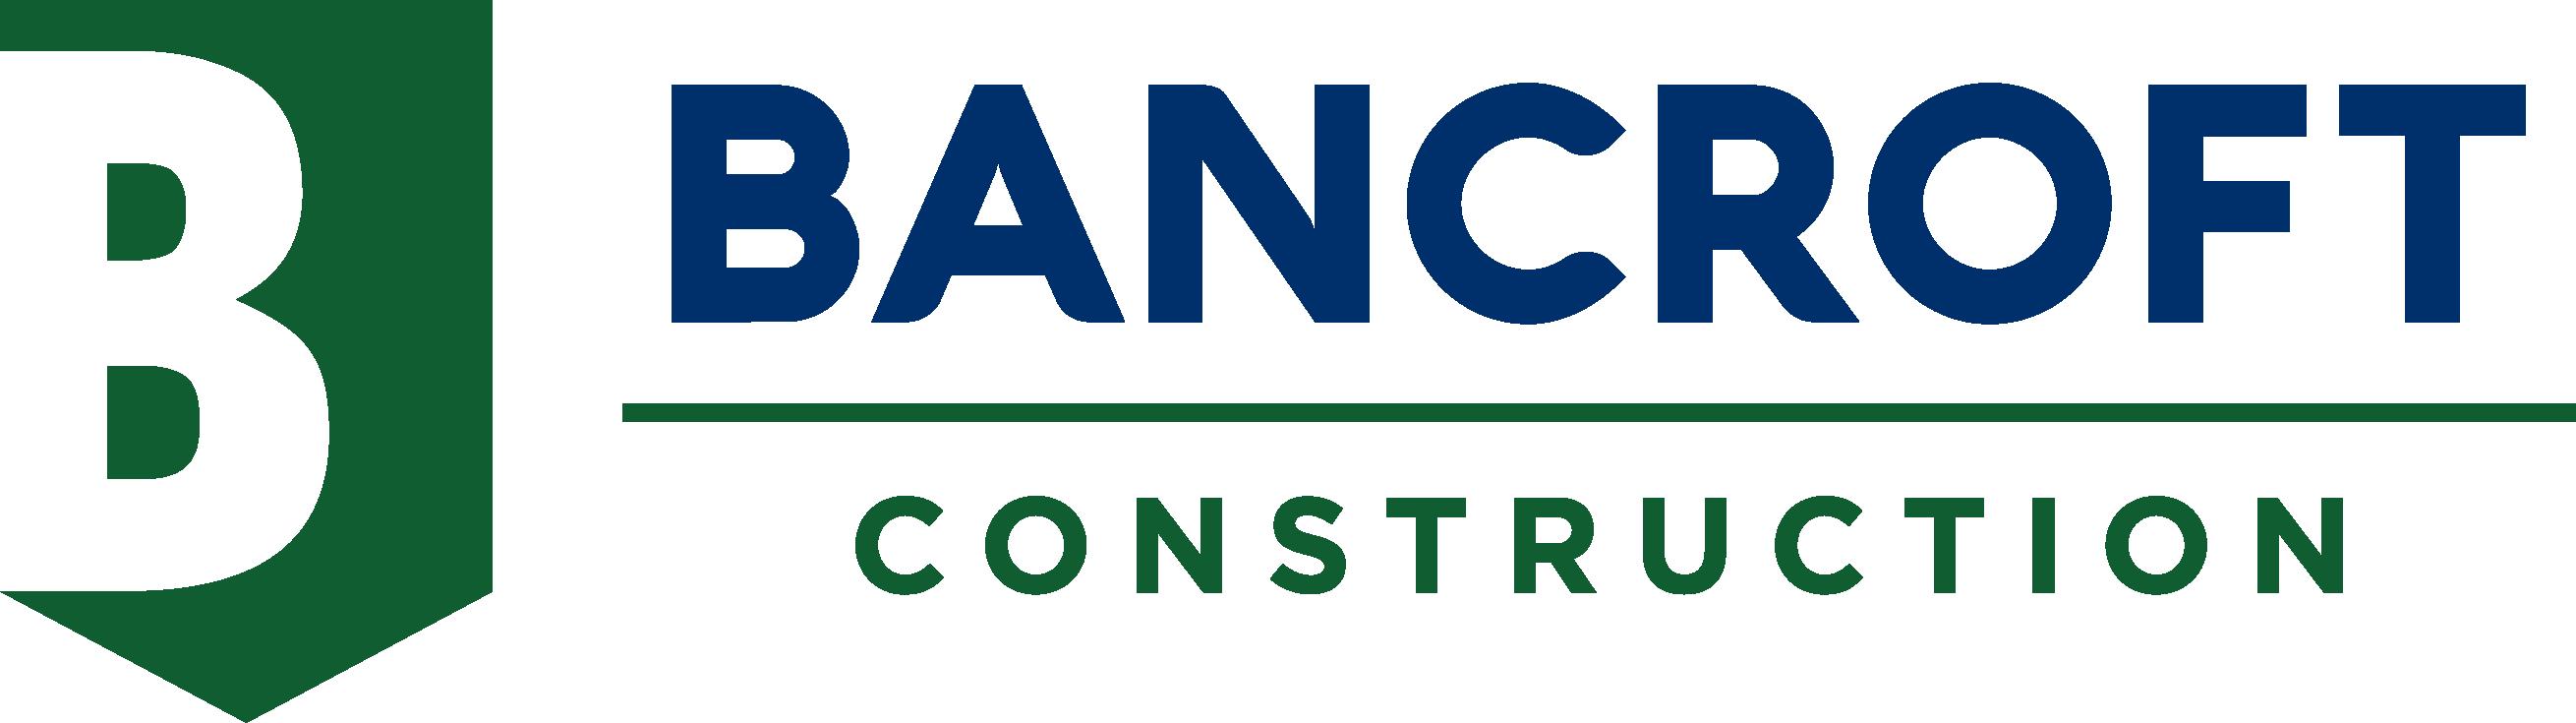 Bancroft Construction logo